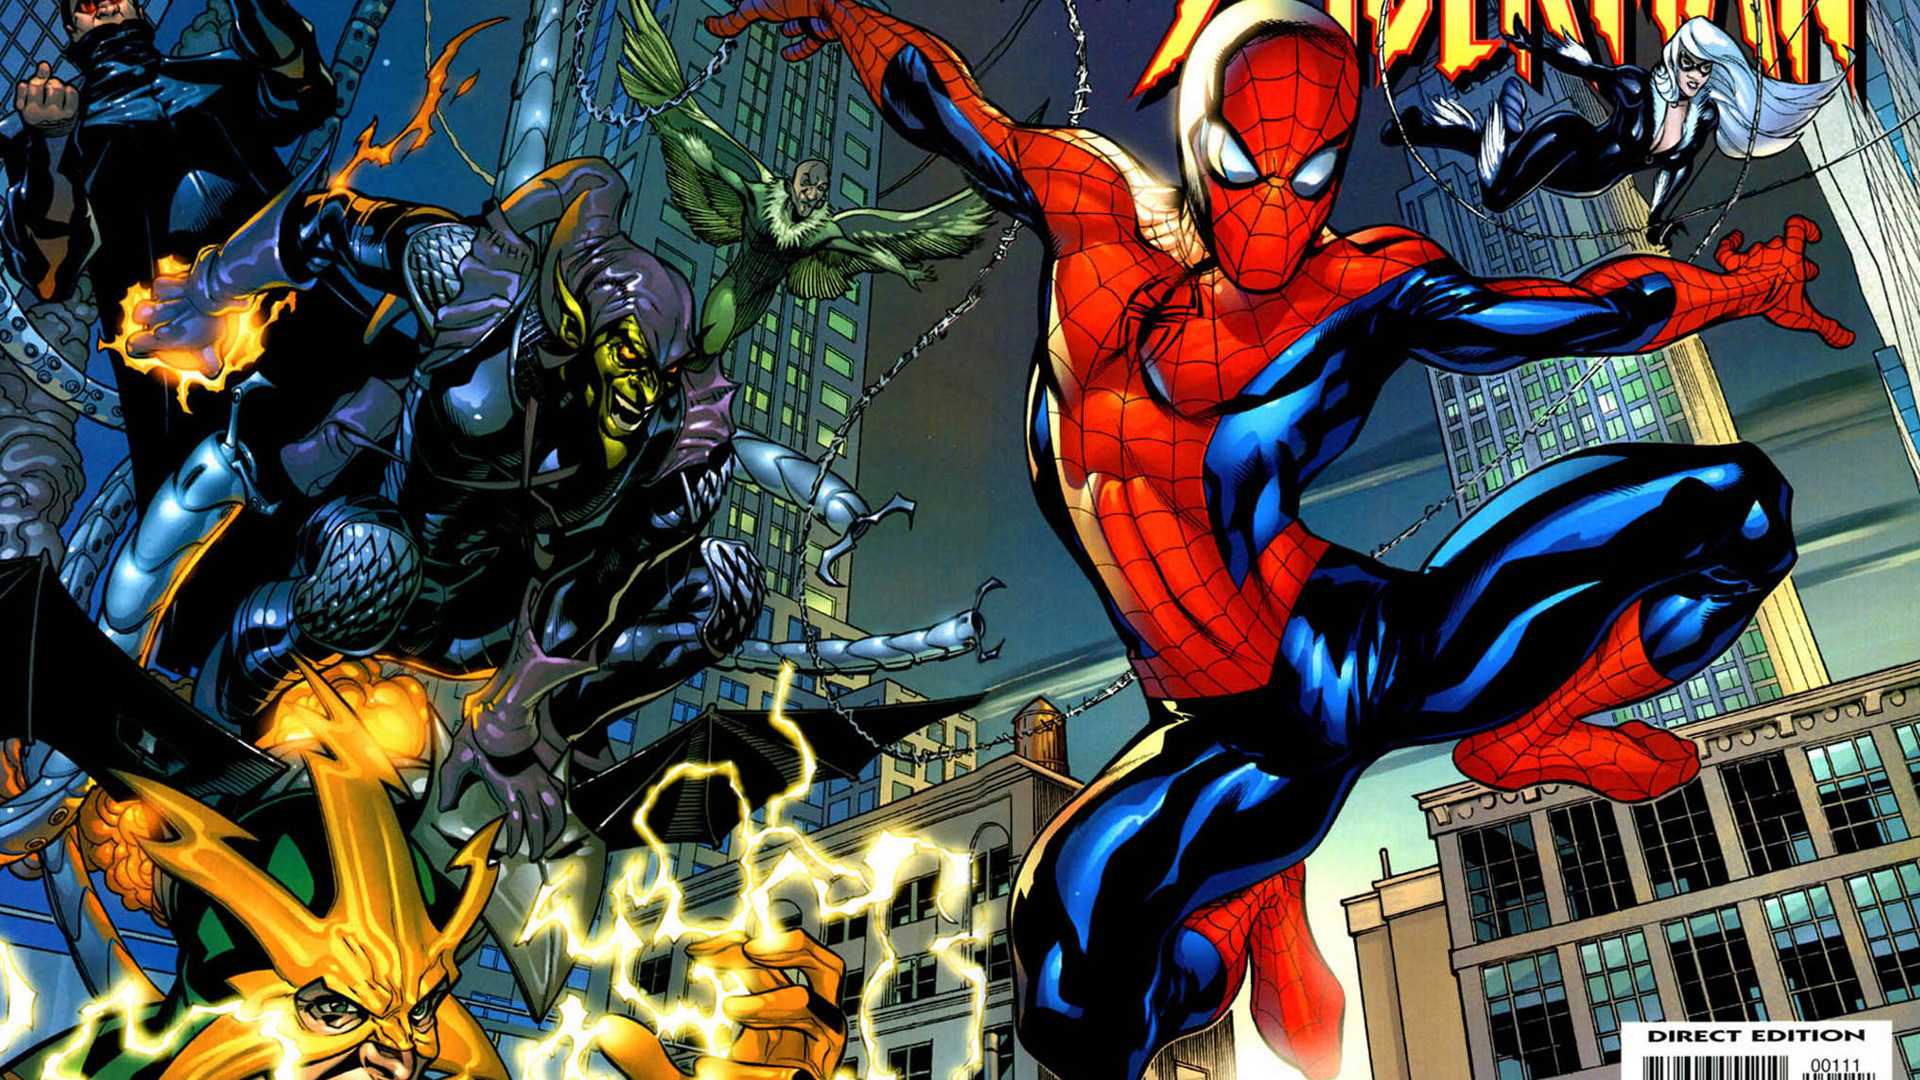 Super hero backgrounds 70 images lego marvel super heroes wallpaper or background 02 voltagebd Image collections